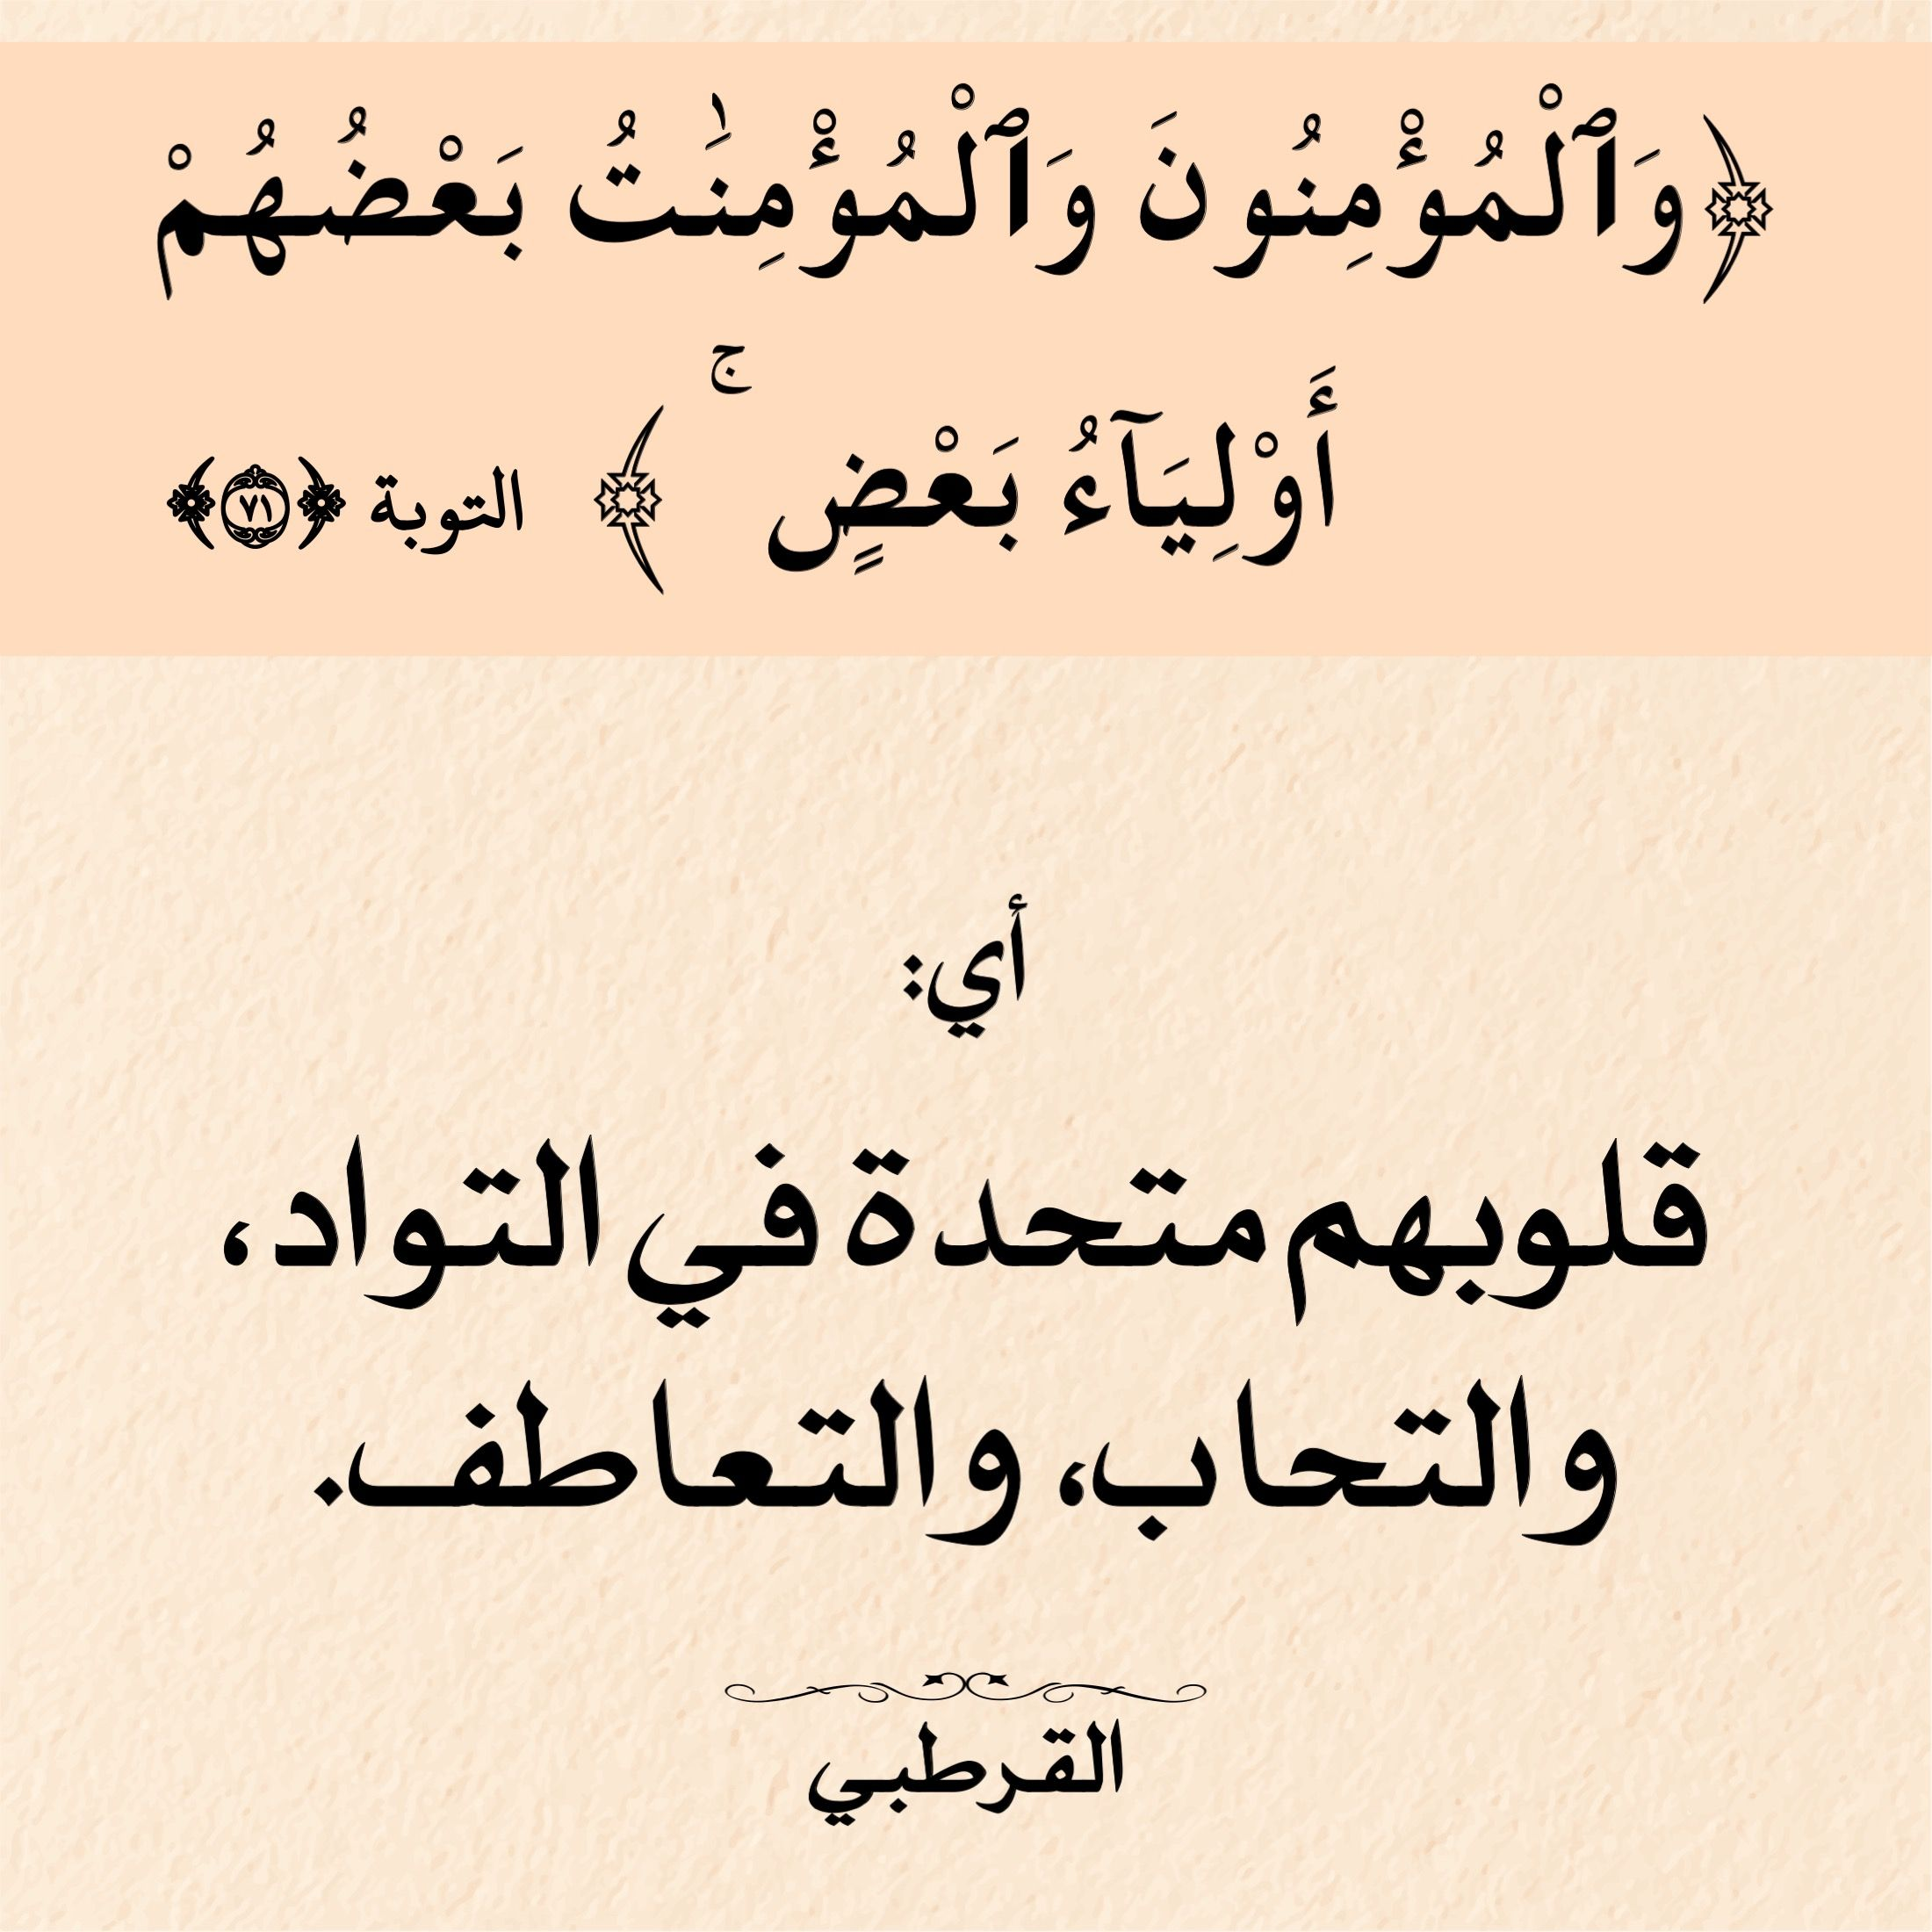 Pin By الأثر الجميل On آية وتفسير Calligraphy Arabic Calligraphy Arabic